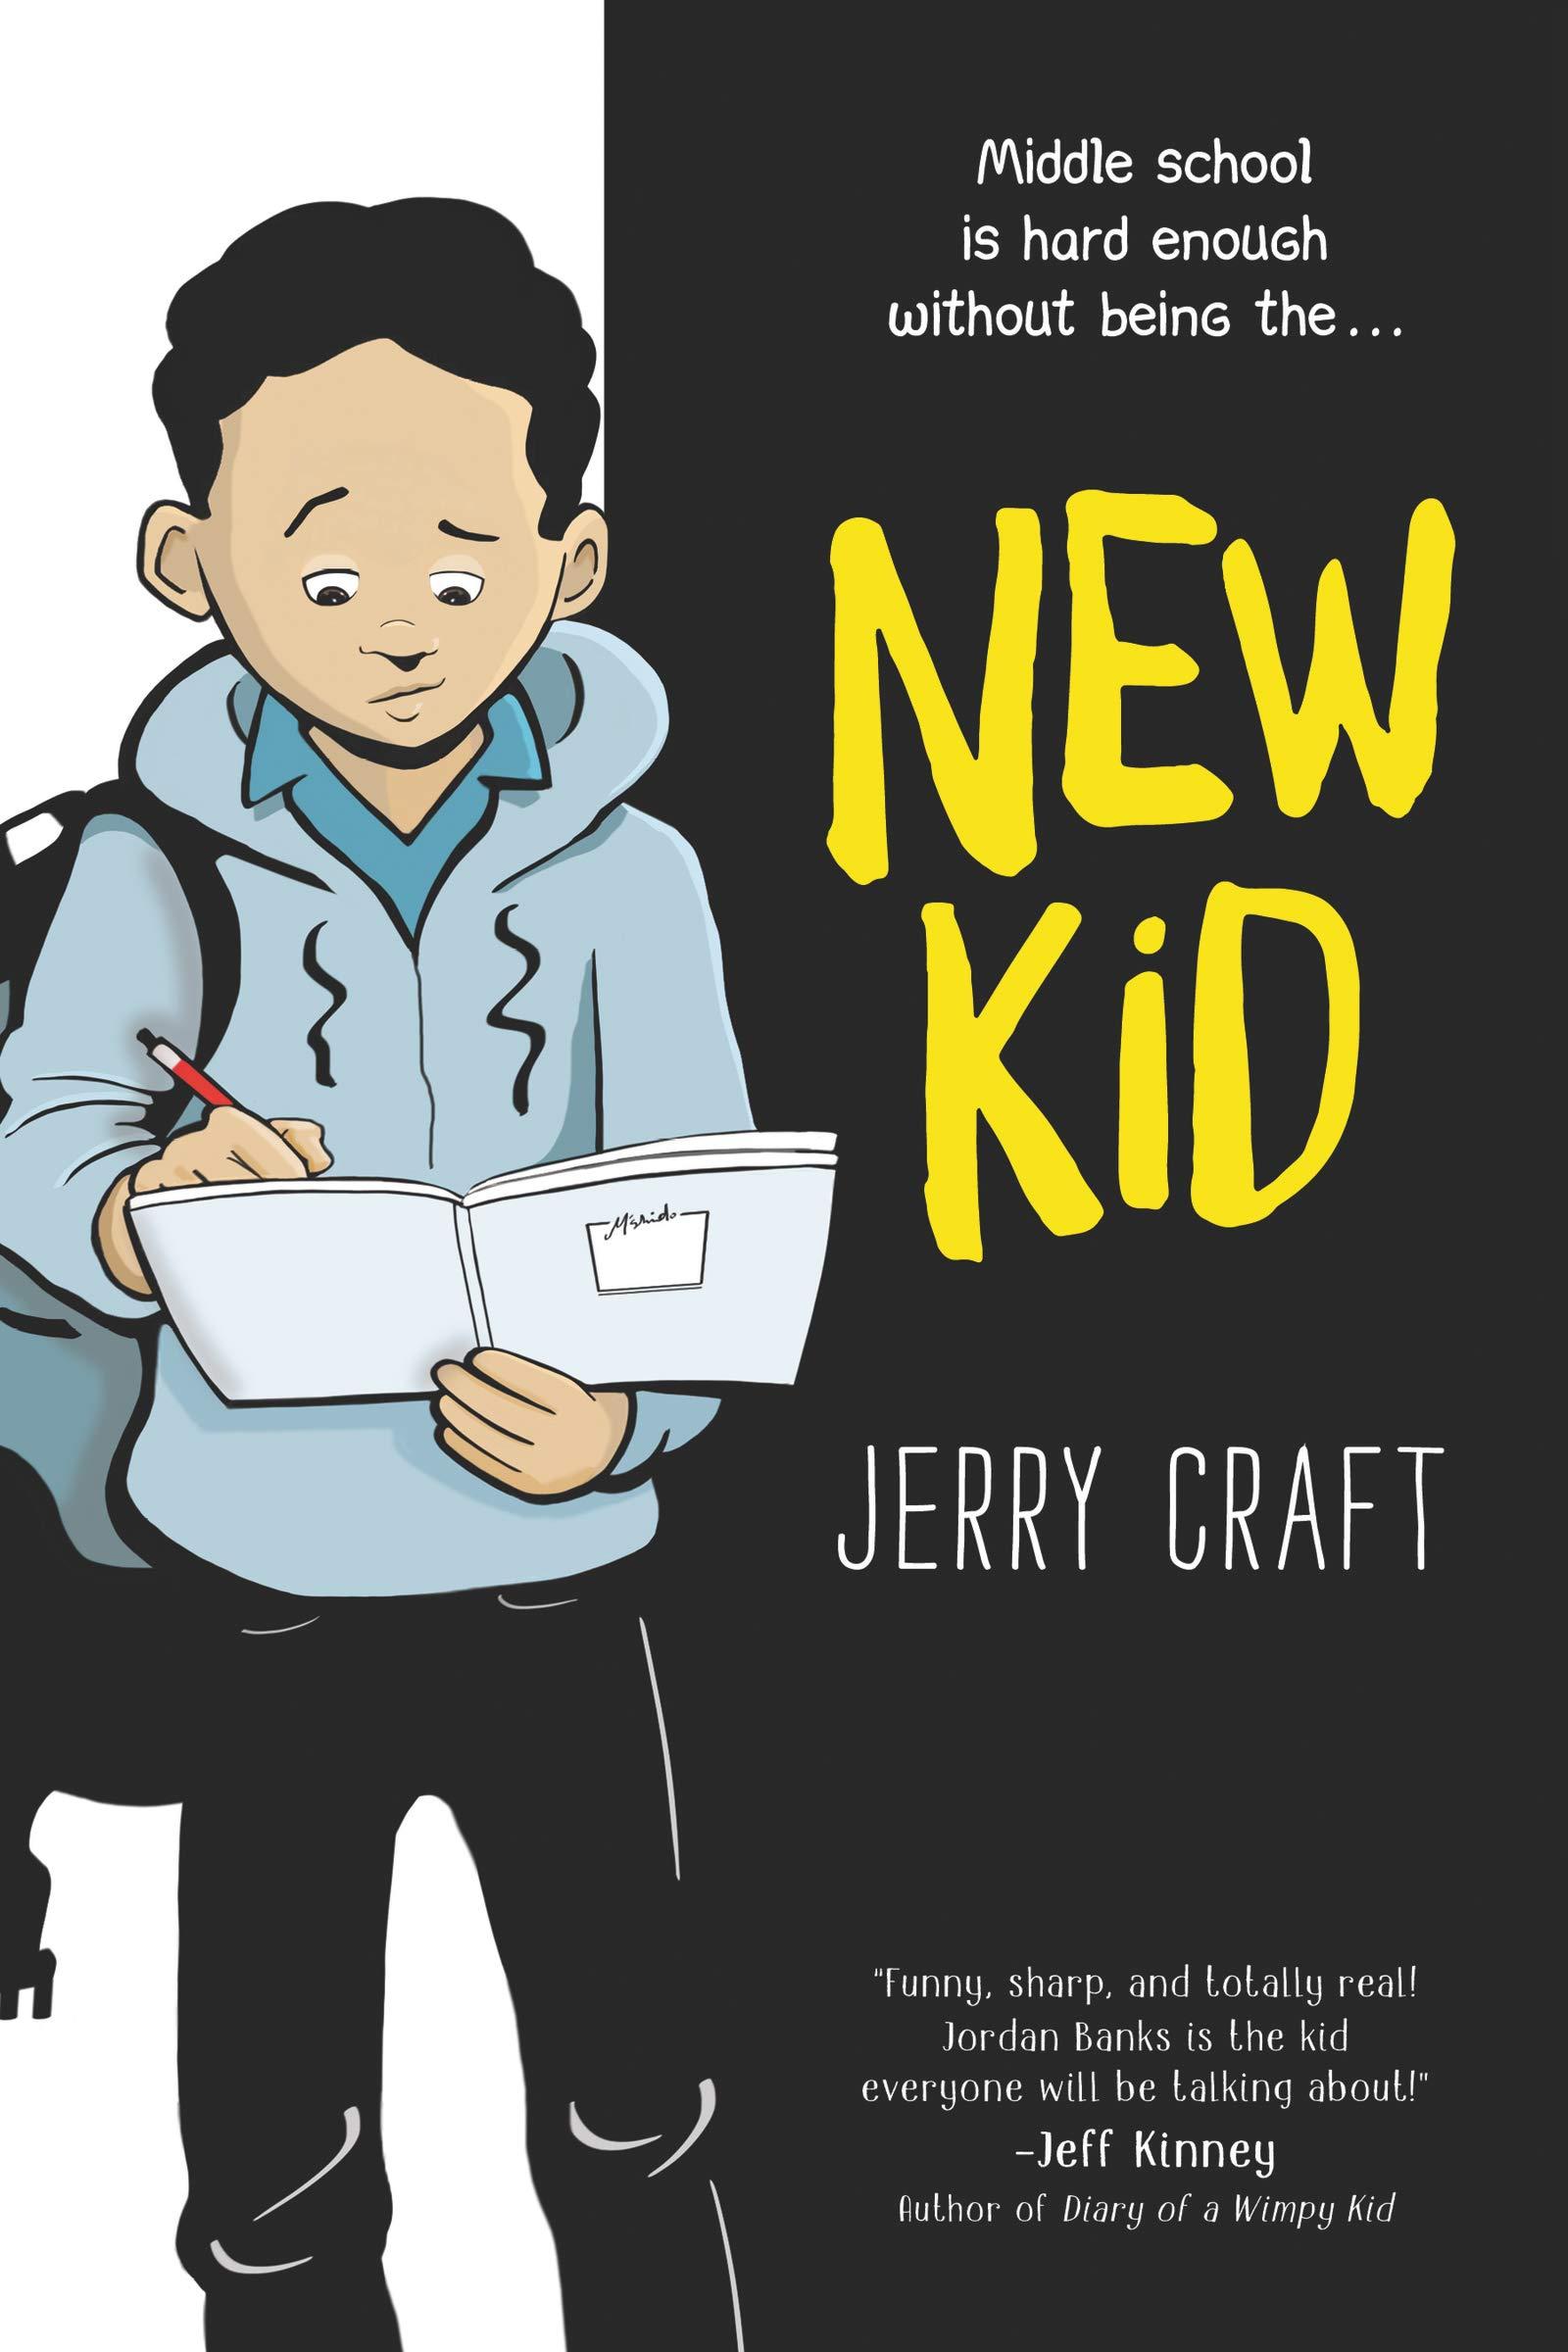 craft-new-kid.jpg